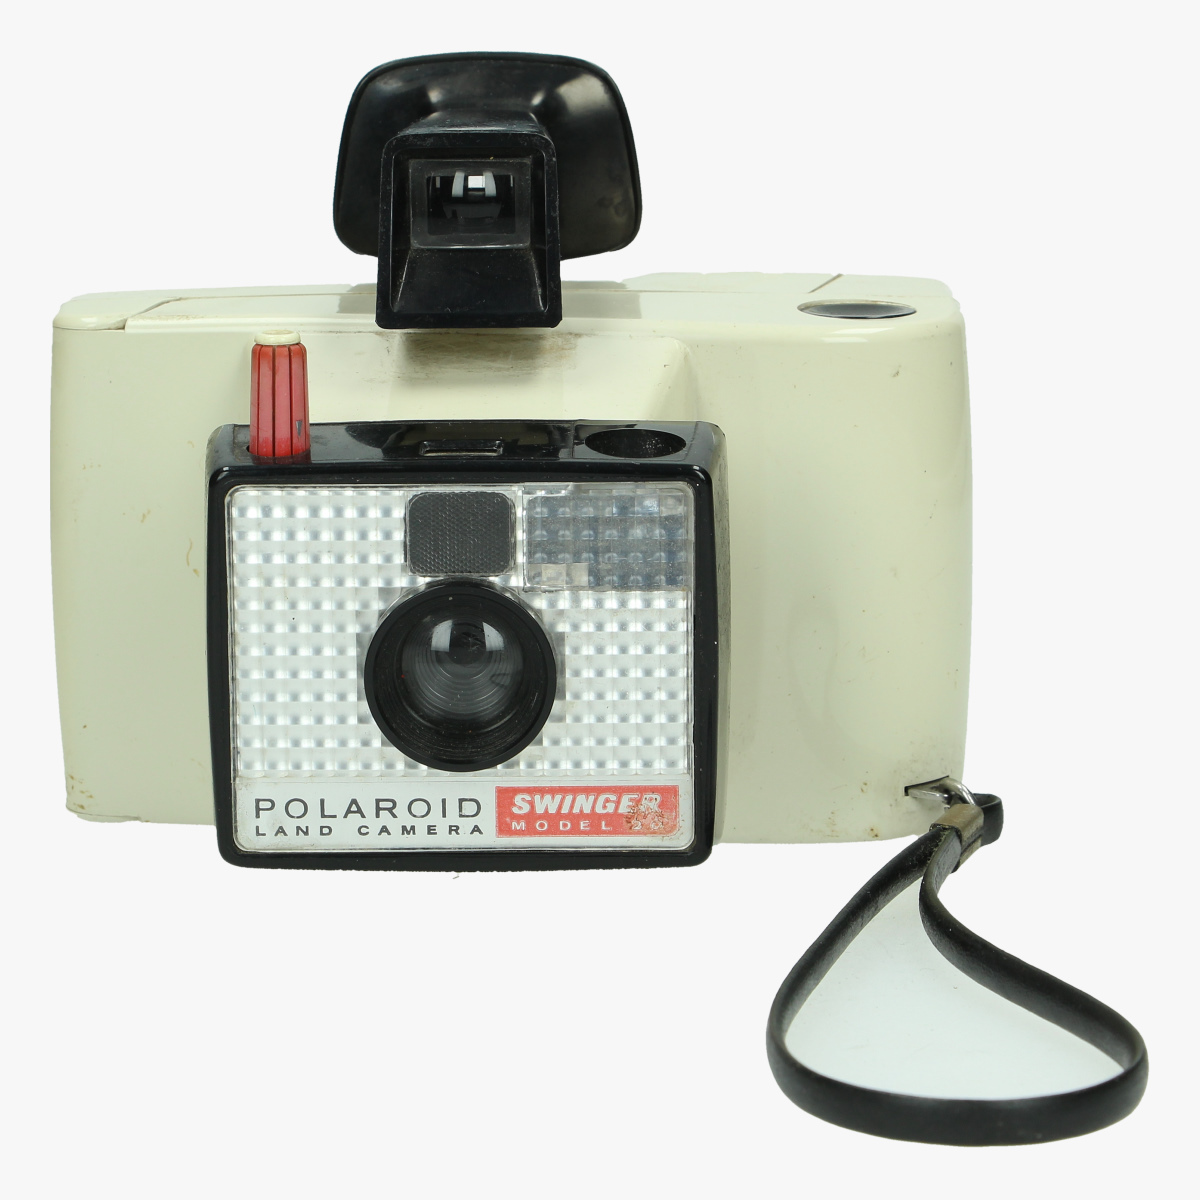 Afbeeldingen van fotocamera polaroid land camera swinger model